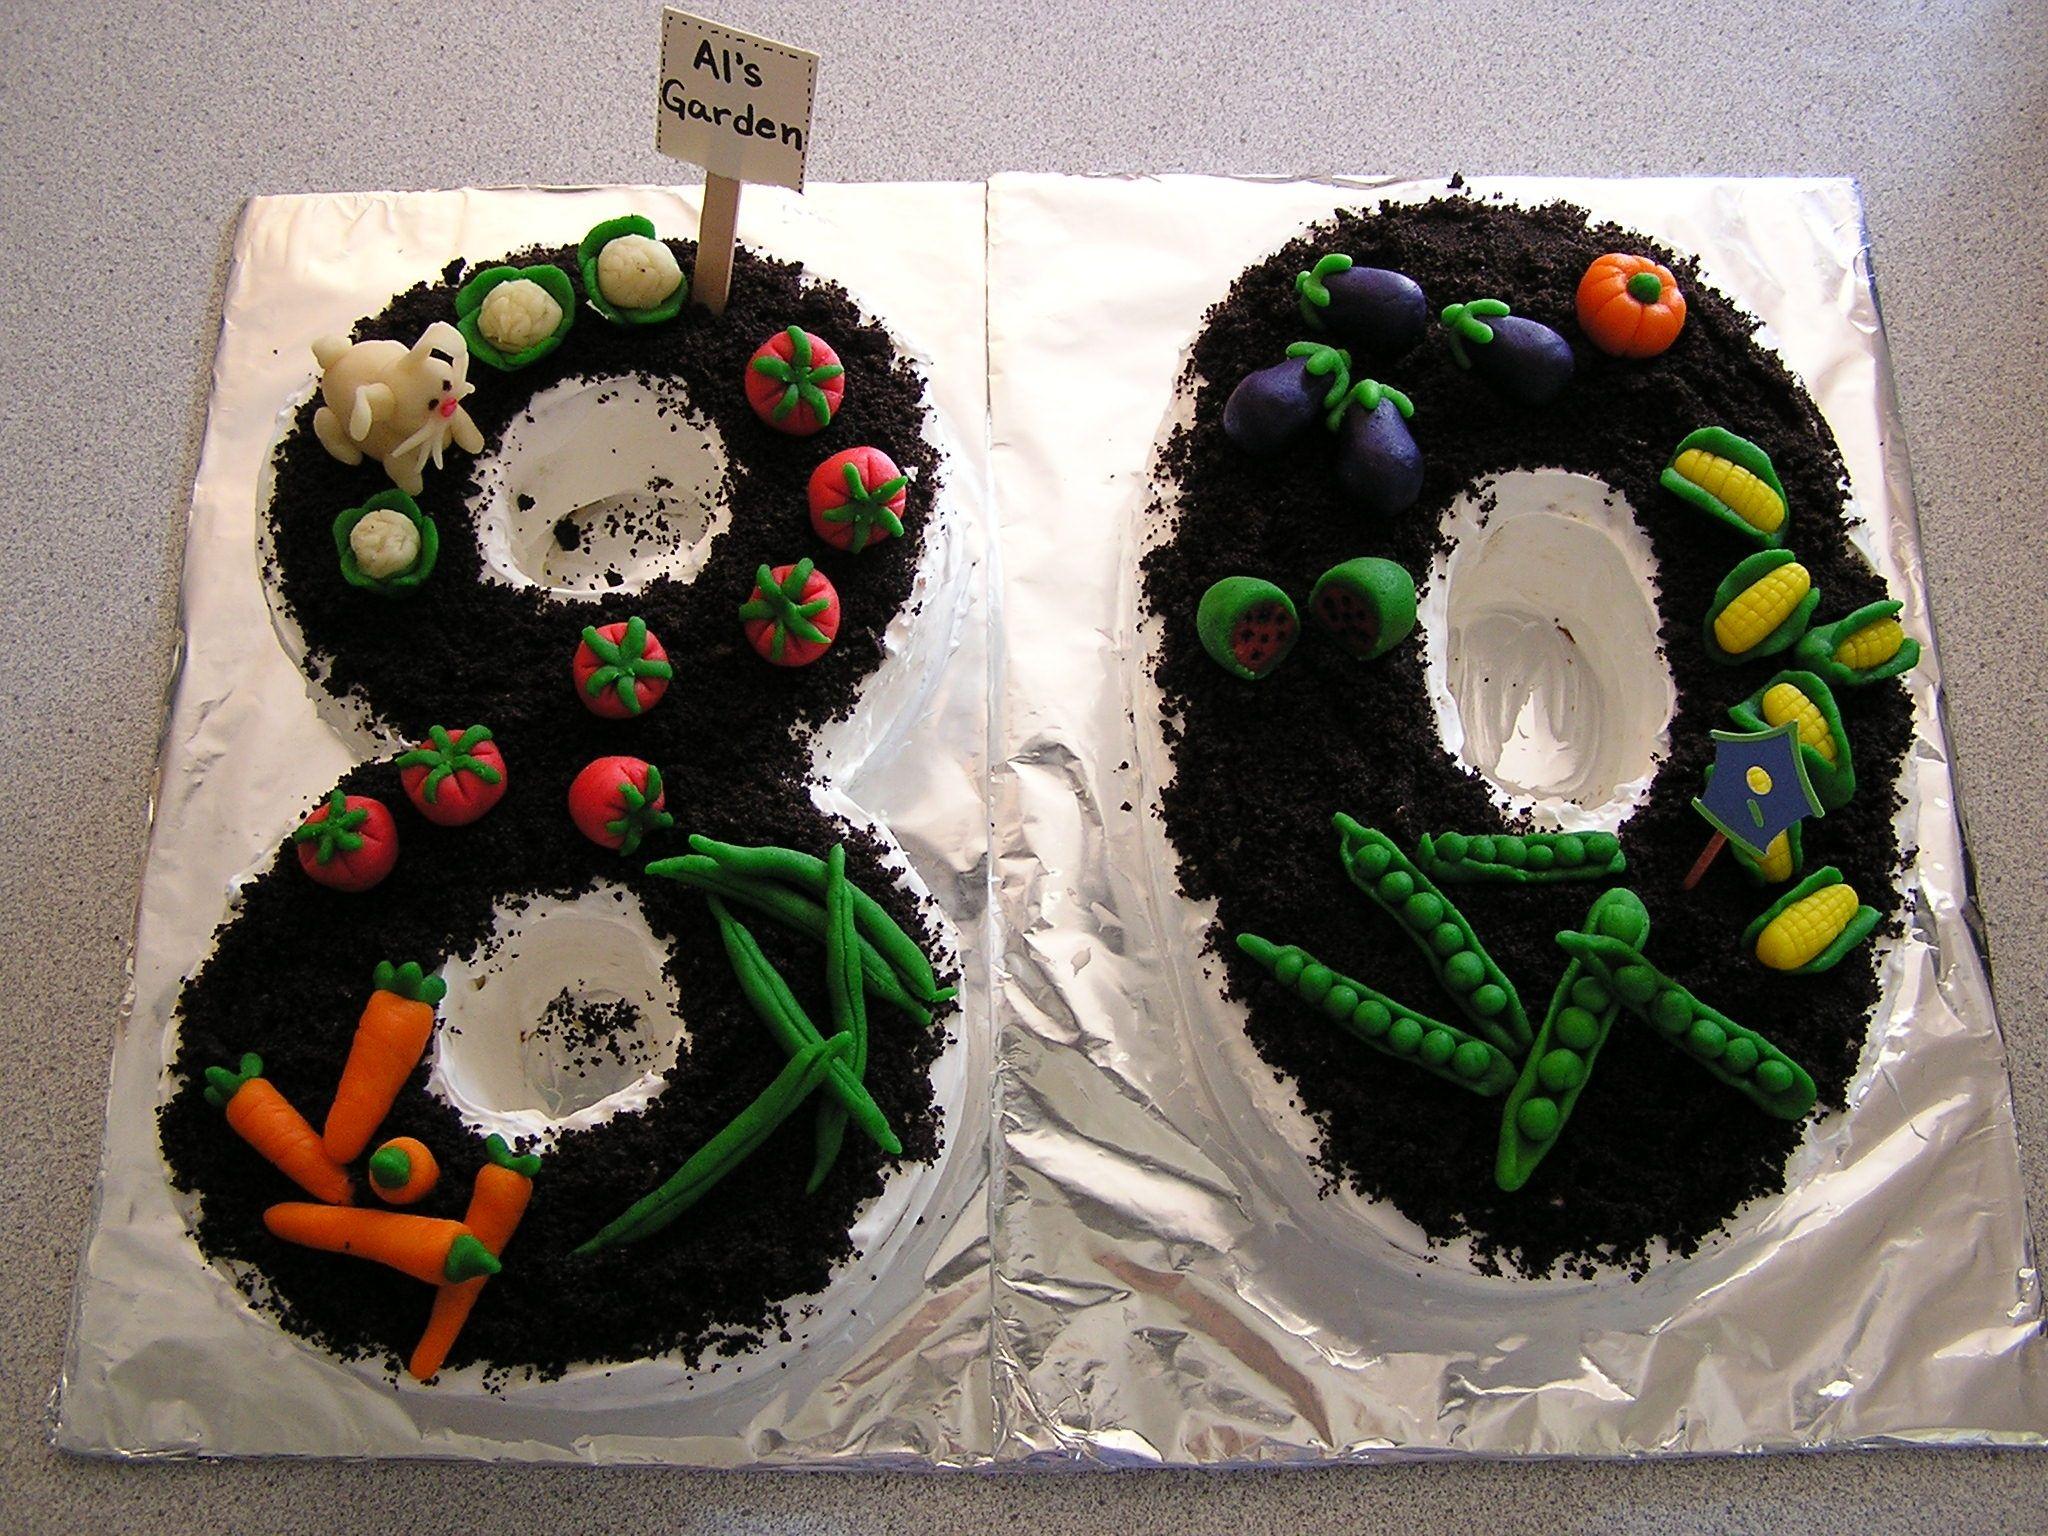 Garden Cake For Dads 80th Birthday Favorite Recipes Pinterest